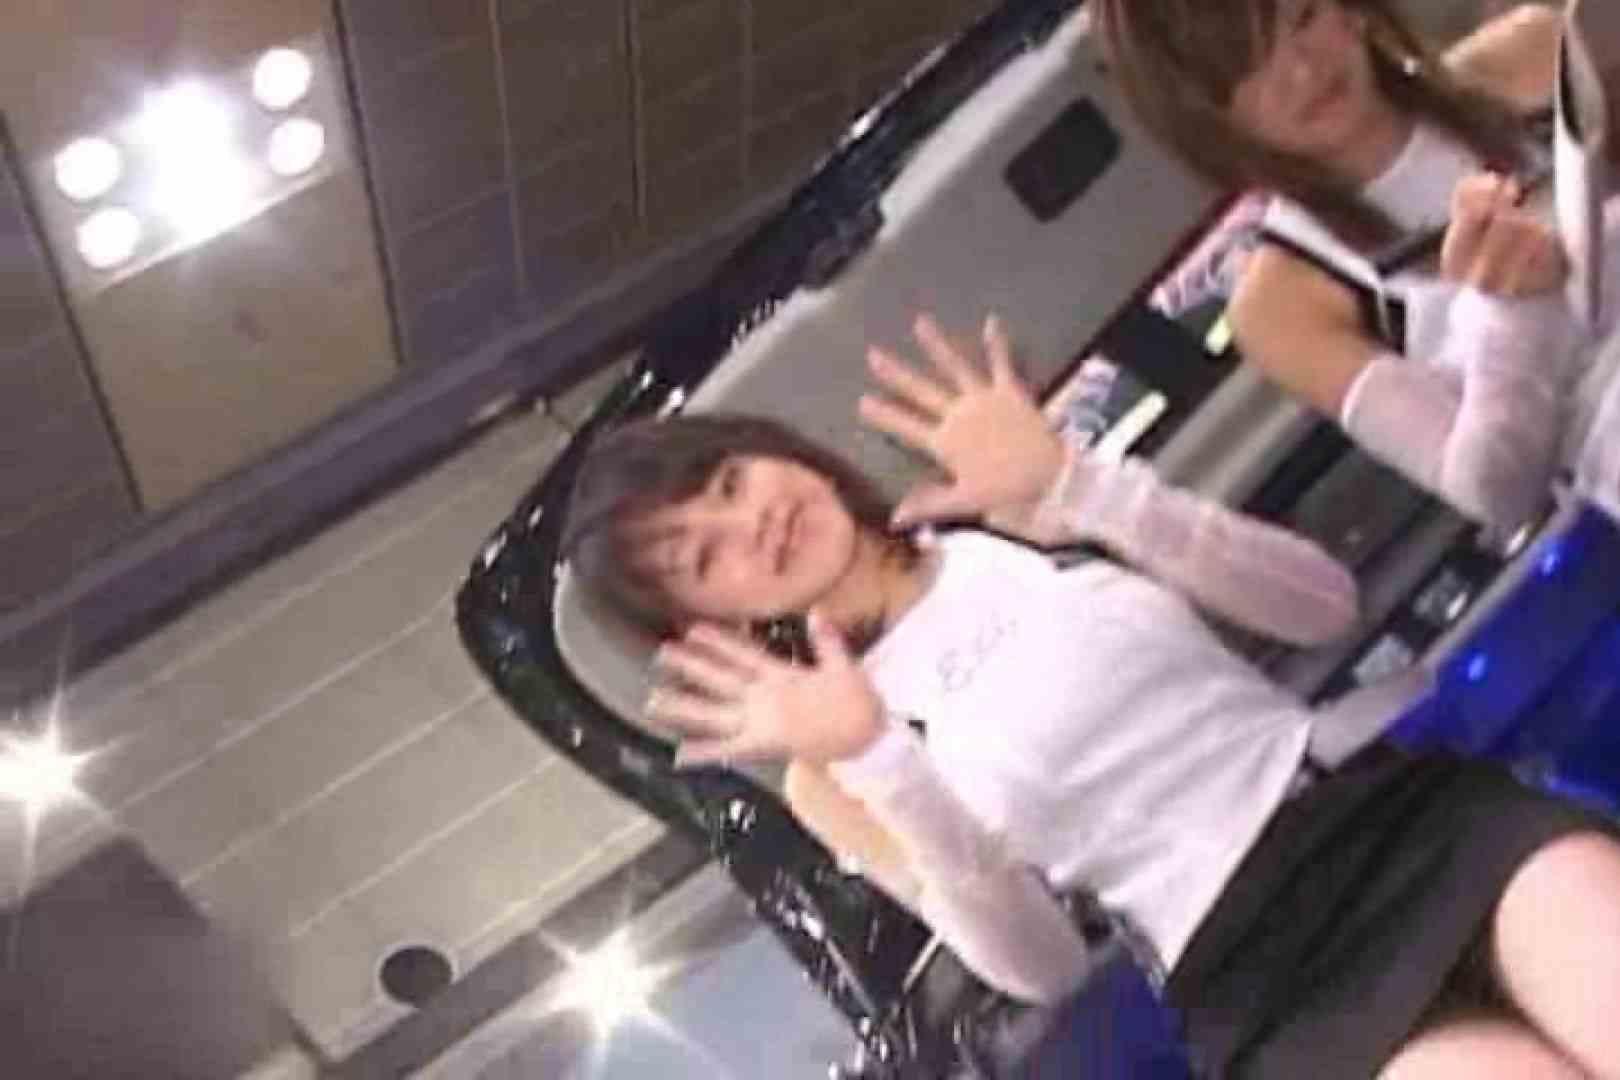 RQカメラ地獄Vol.36 チラ オマンコ無修正動画無料 89pic 53